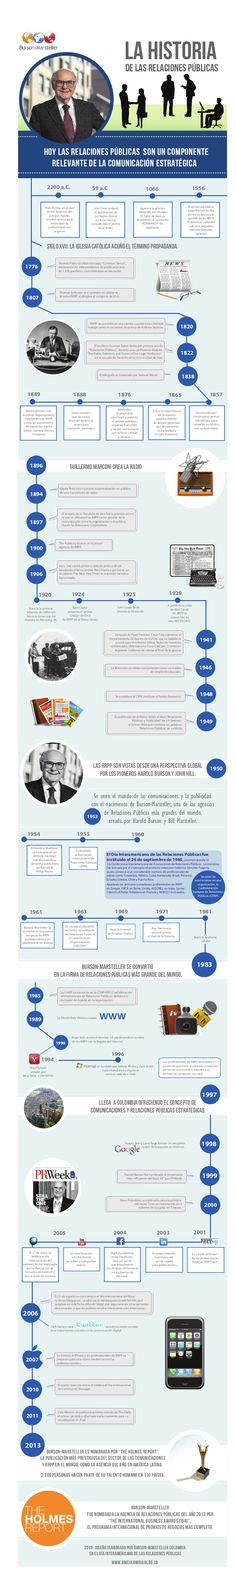 Historia de las Relaciones Públicas #infografia #infographic #marketing